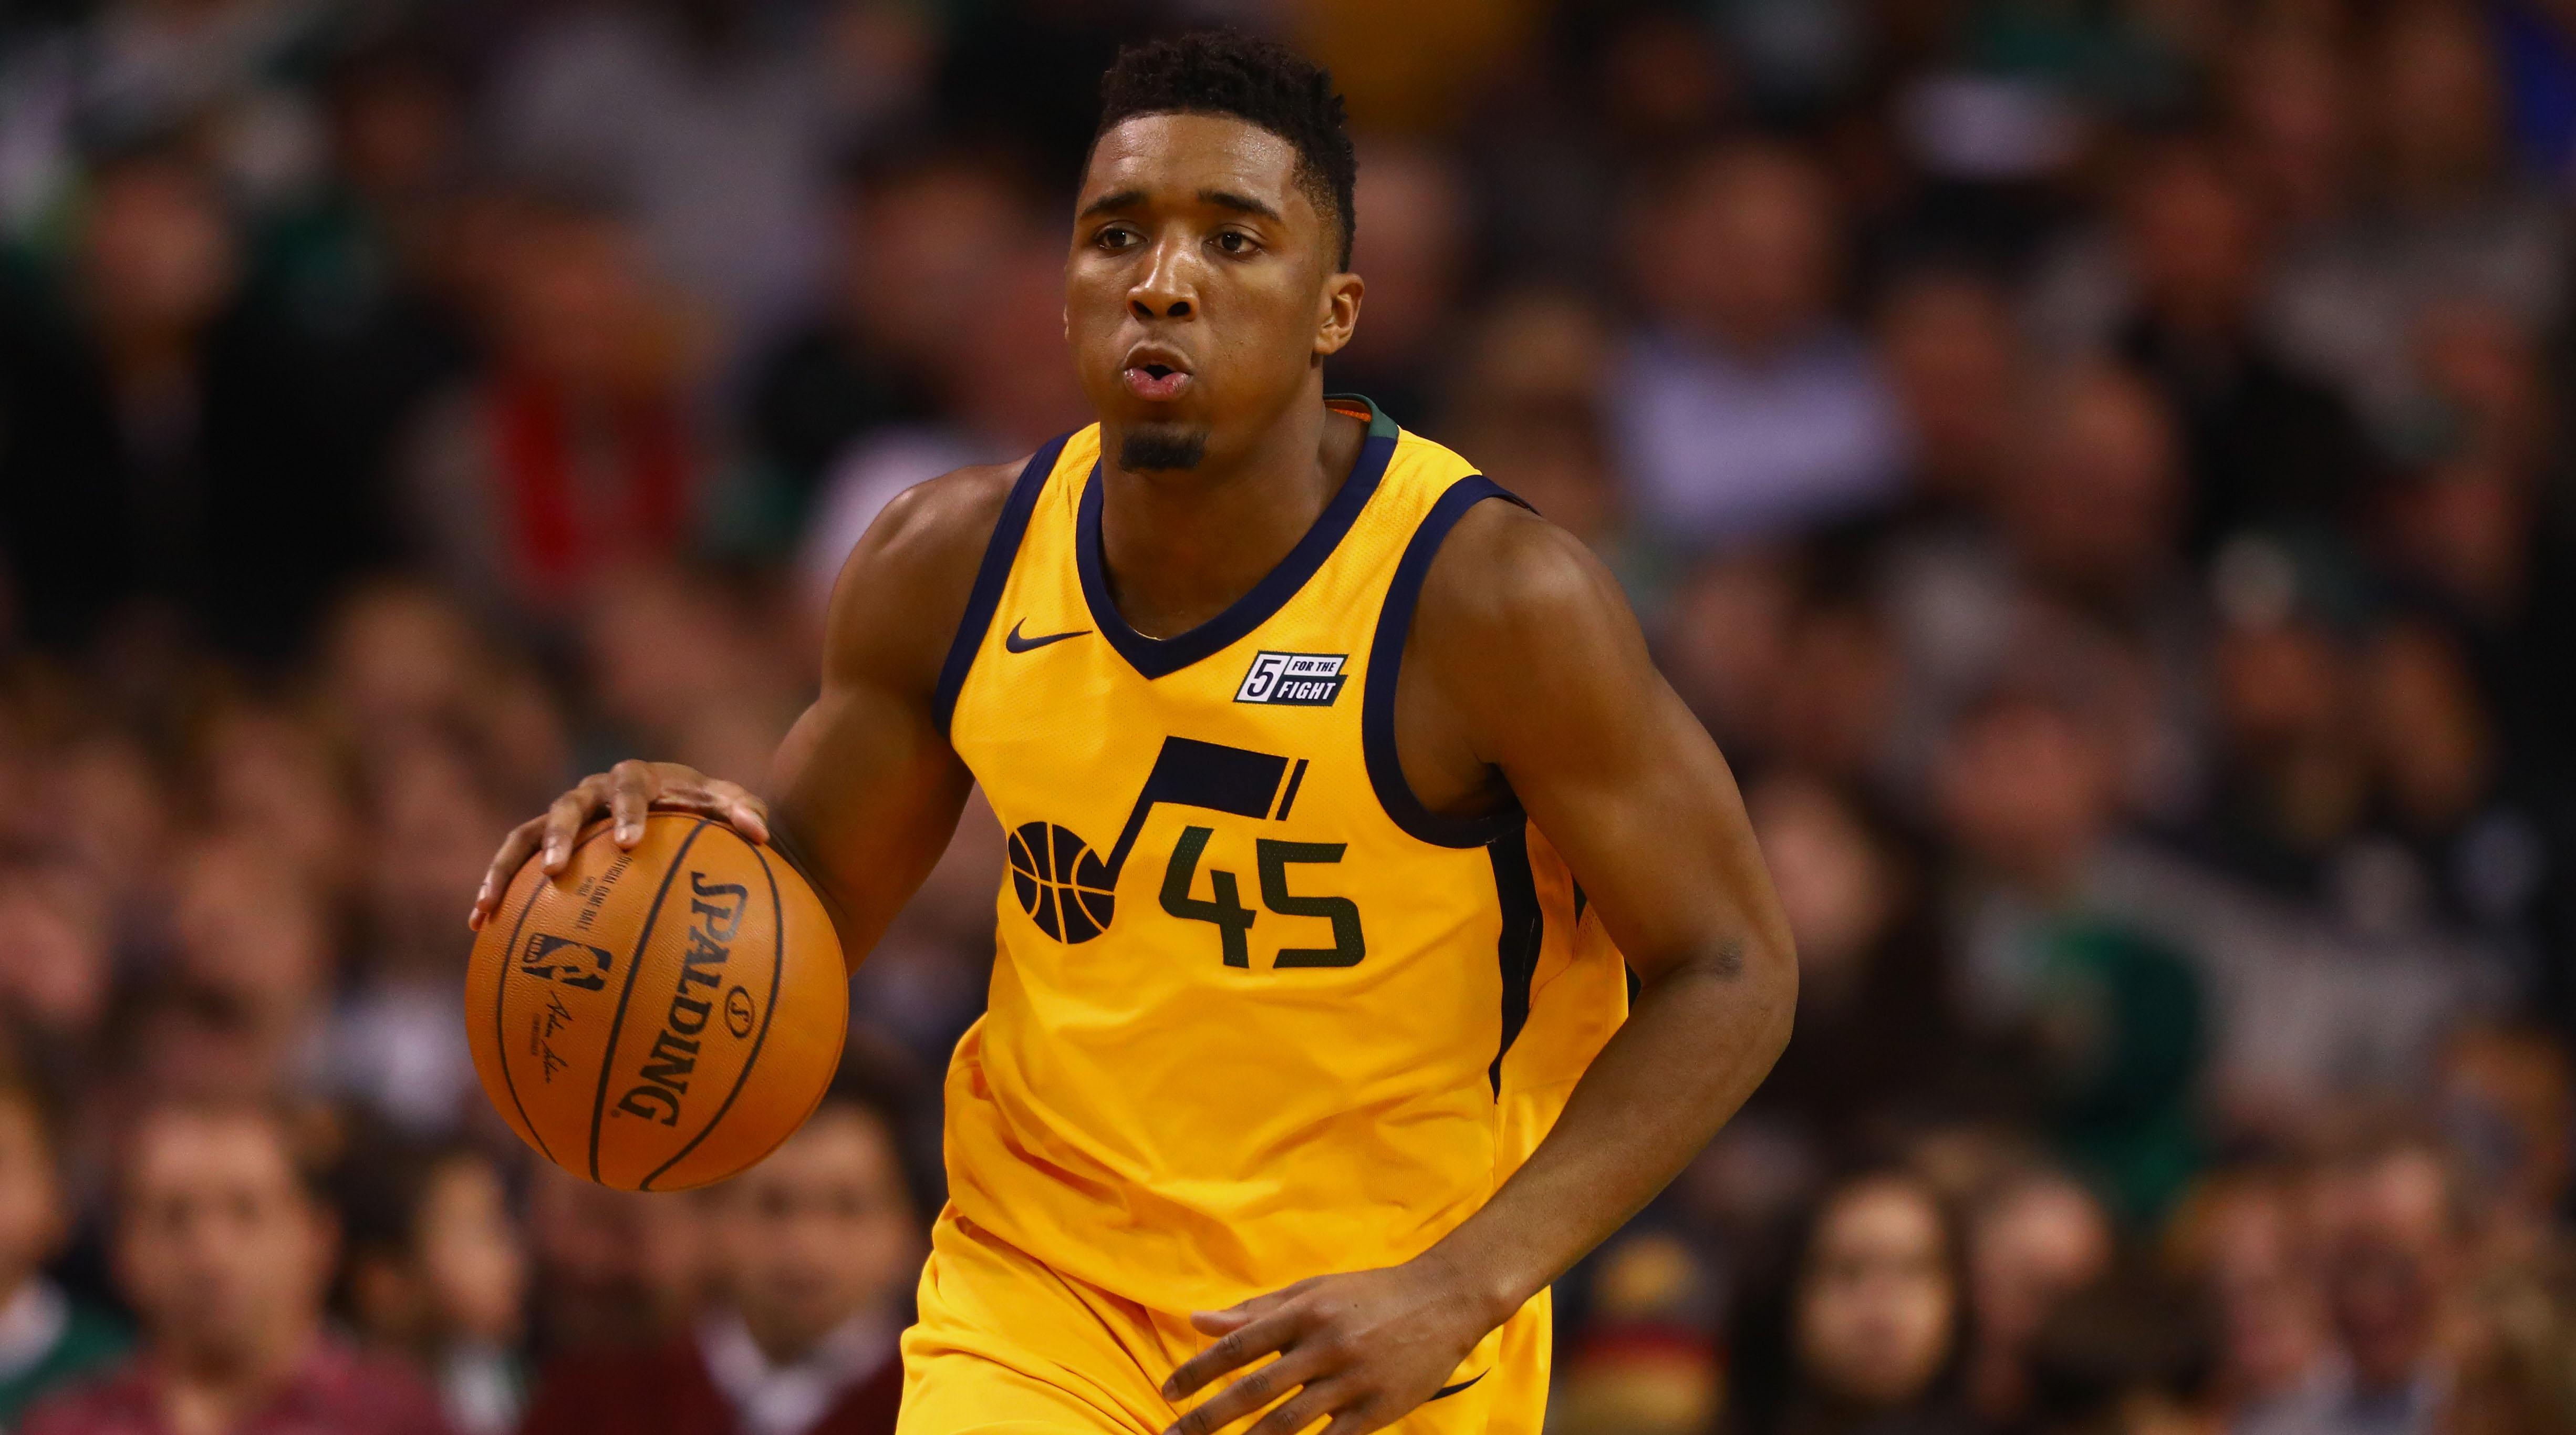 Donovan Mitchell Stats Nba >> Donovan Mitchell Is the Lifeblood of the Utah Jazz Offense | 15 Min...